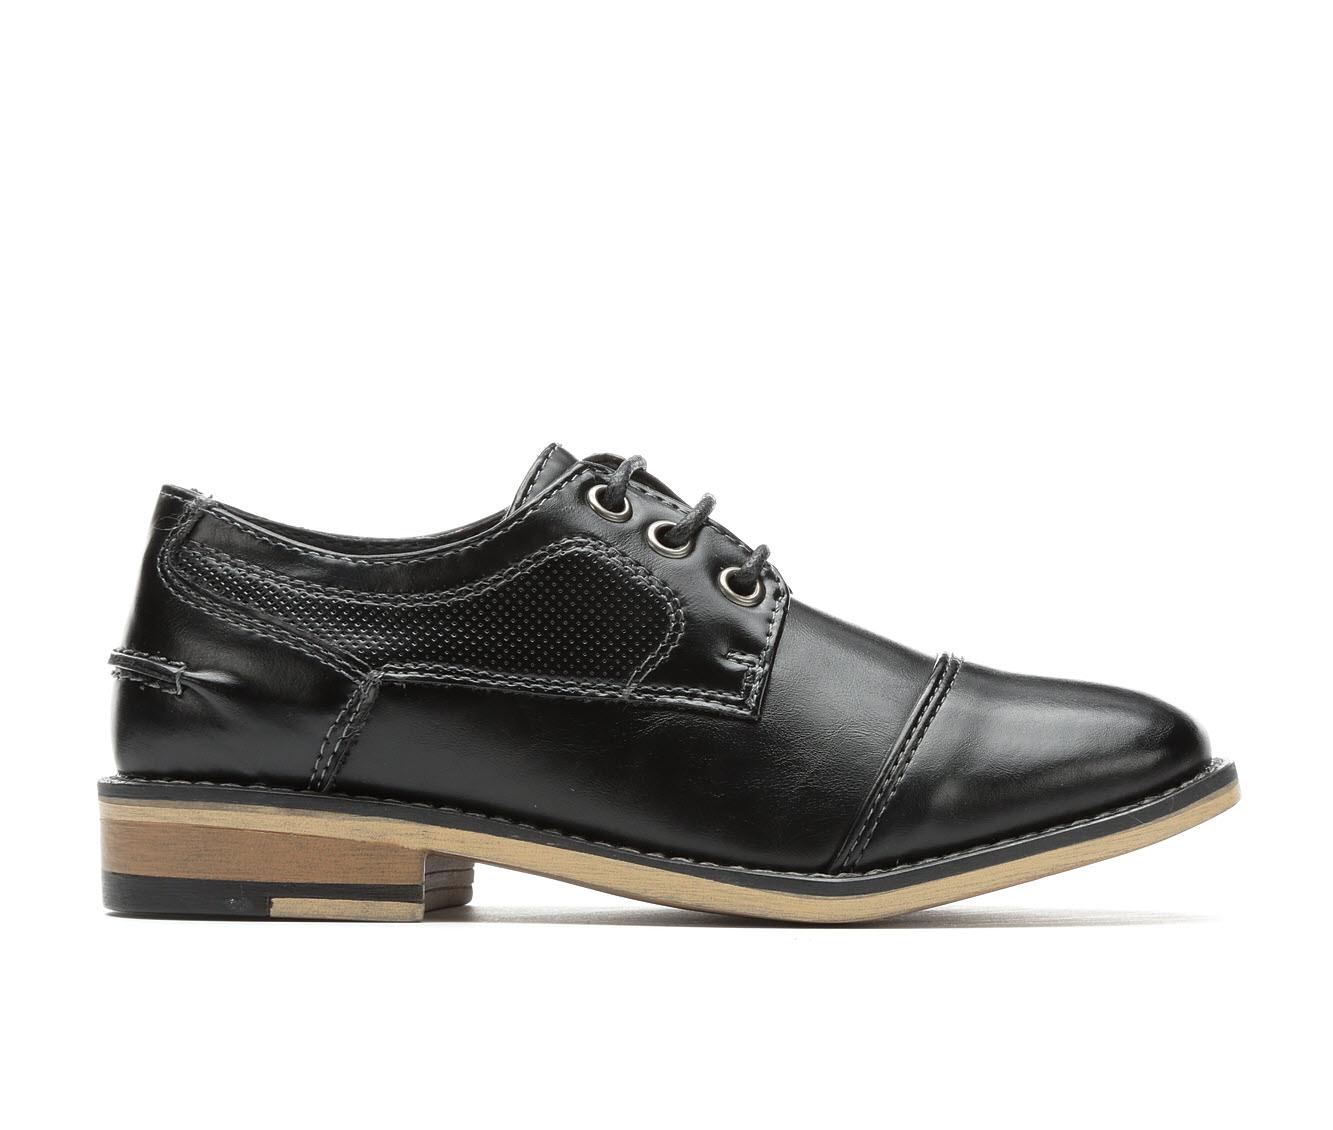 Boys' Madden BStriker Oxford Shoes (Black)